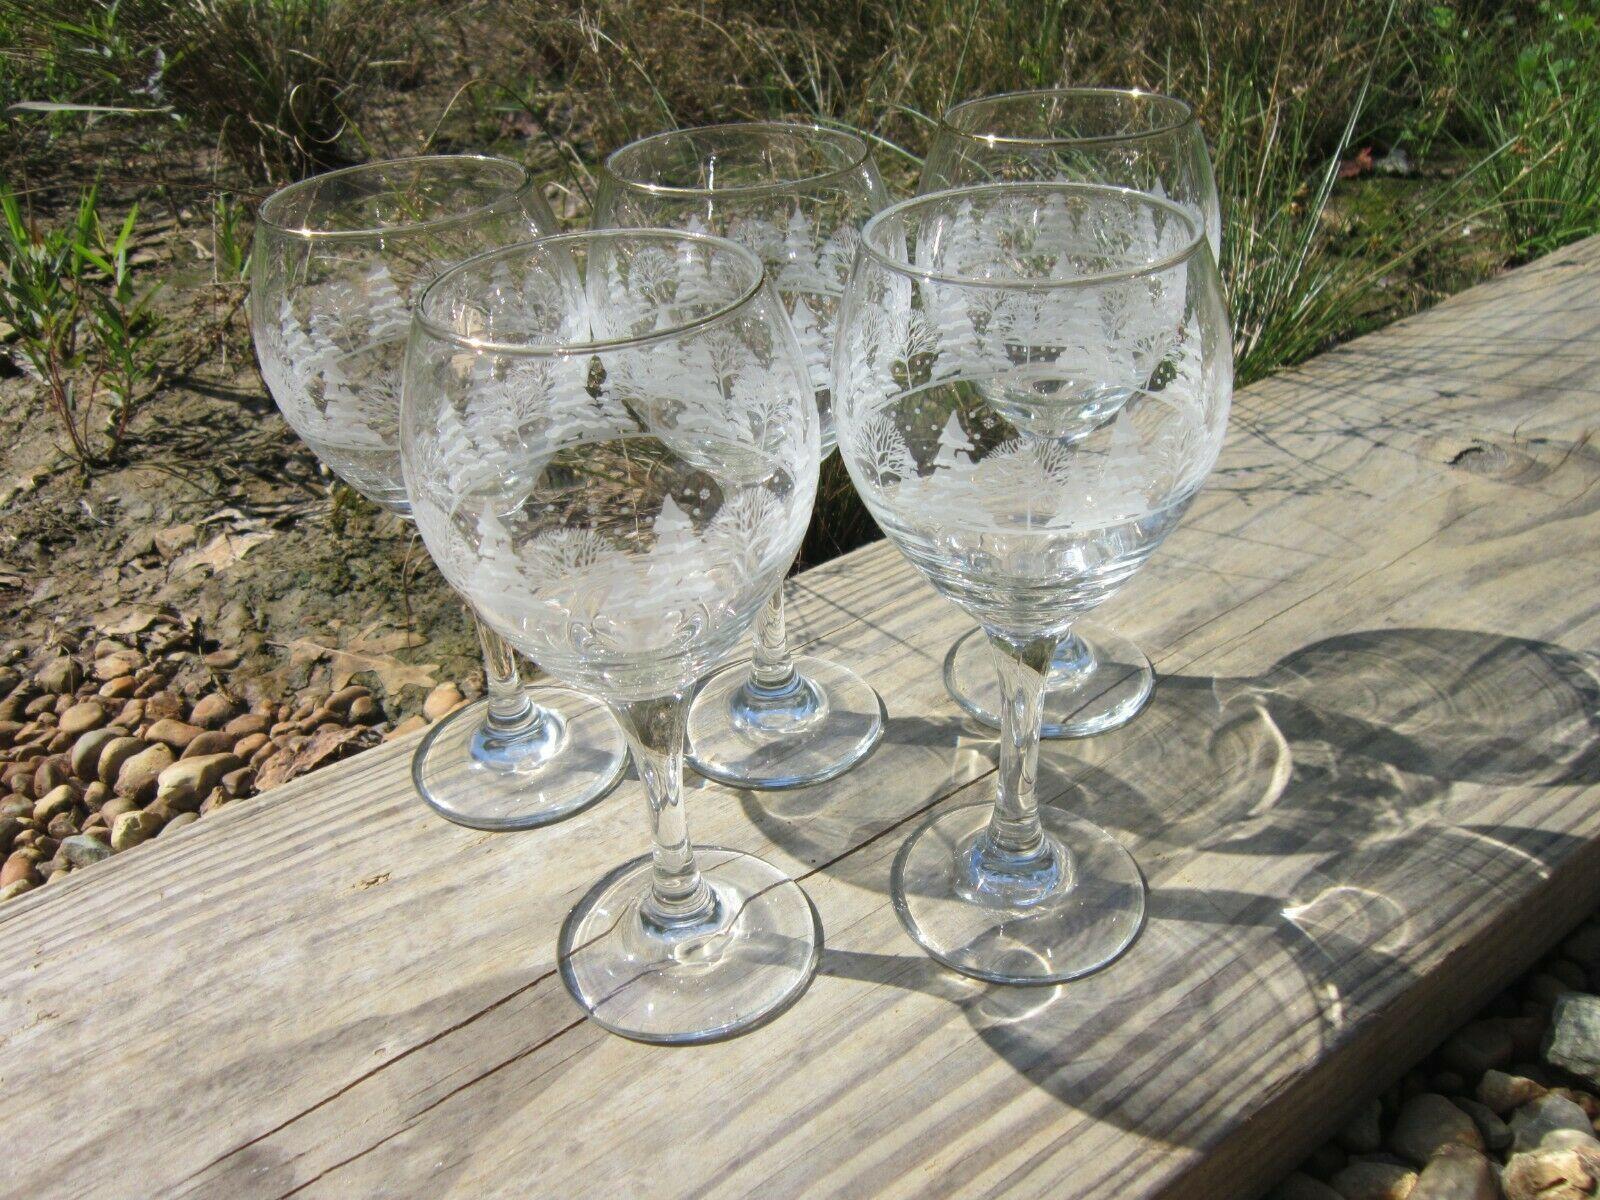 Arby's Winter Goblets, Set of 5 Vintage 1980s Wine Glasses